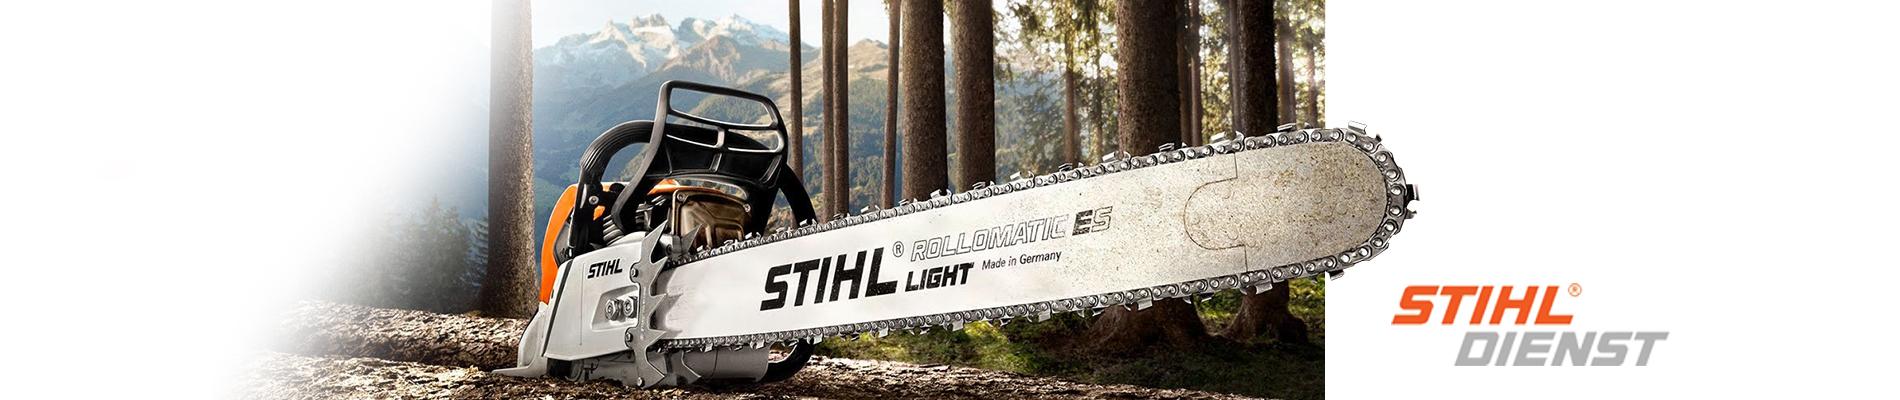 Stihl-Header-2